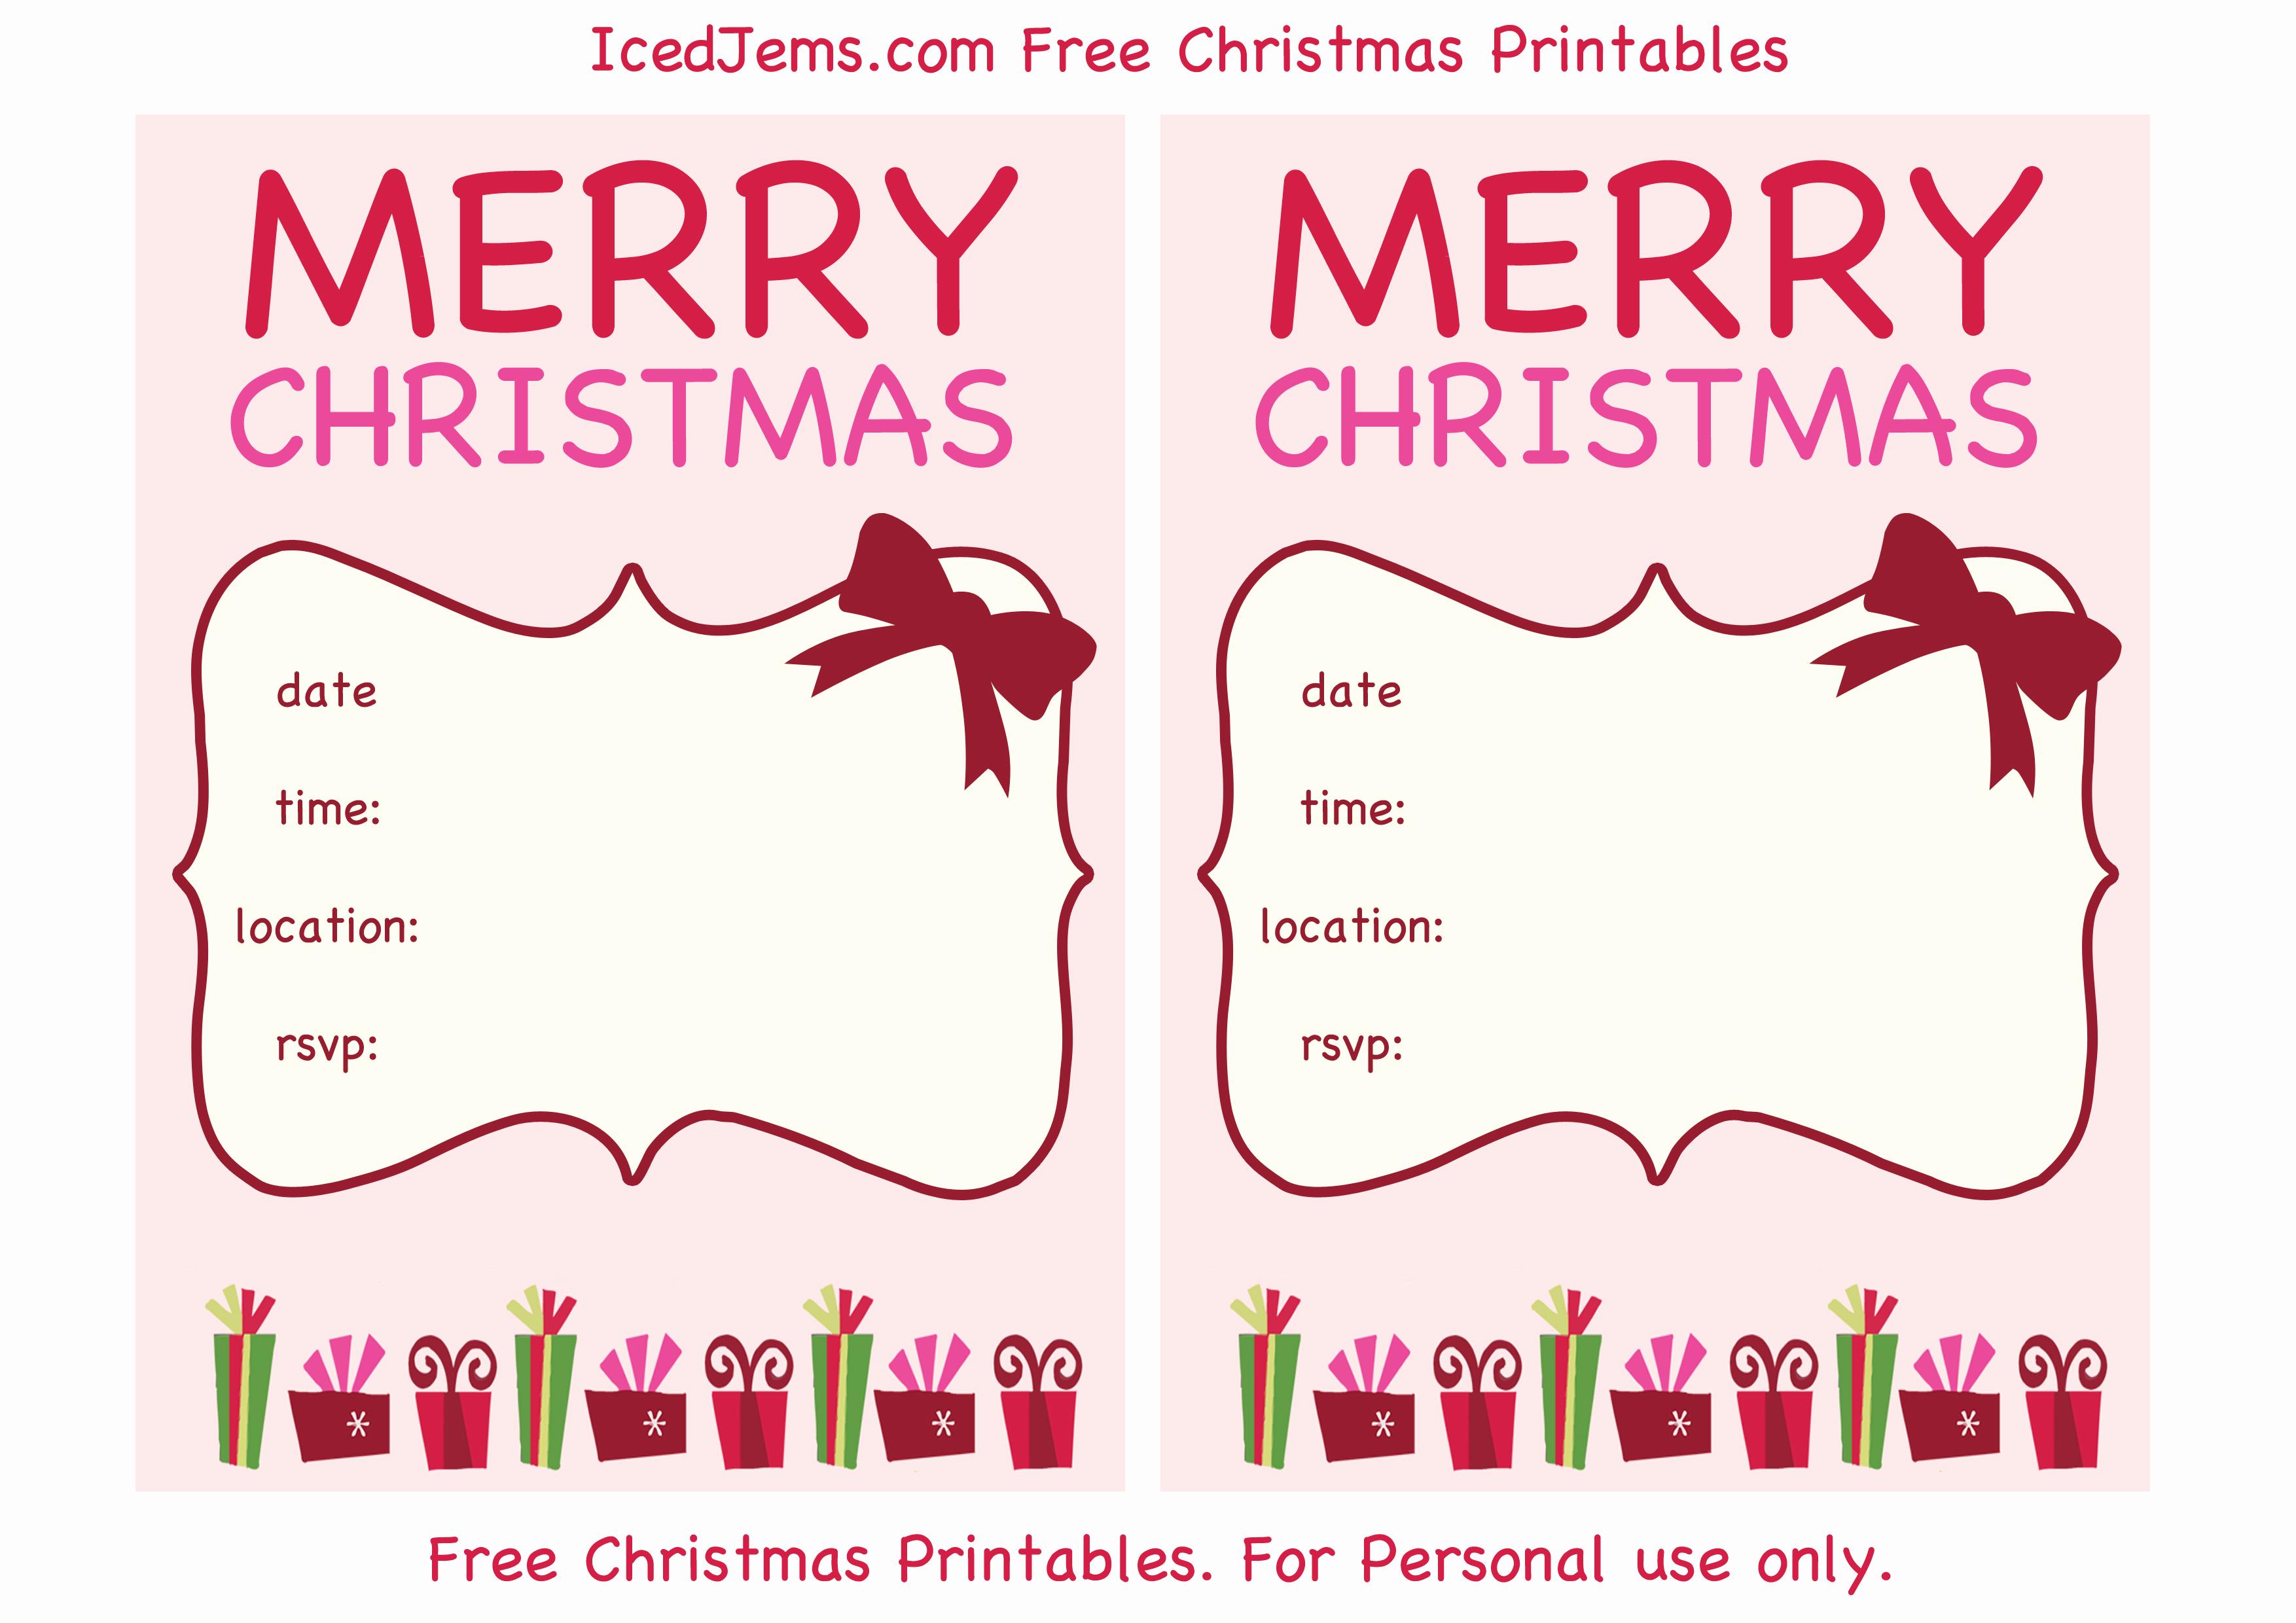 Christmas Party Invitations Free Fresh Free Christmas Party Printables